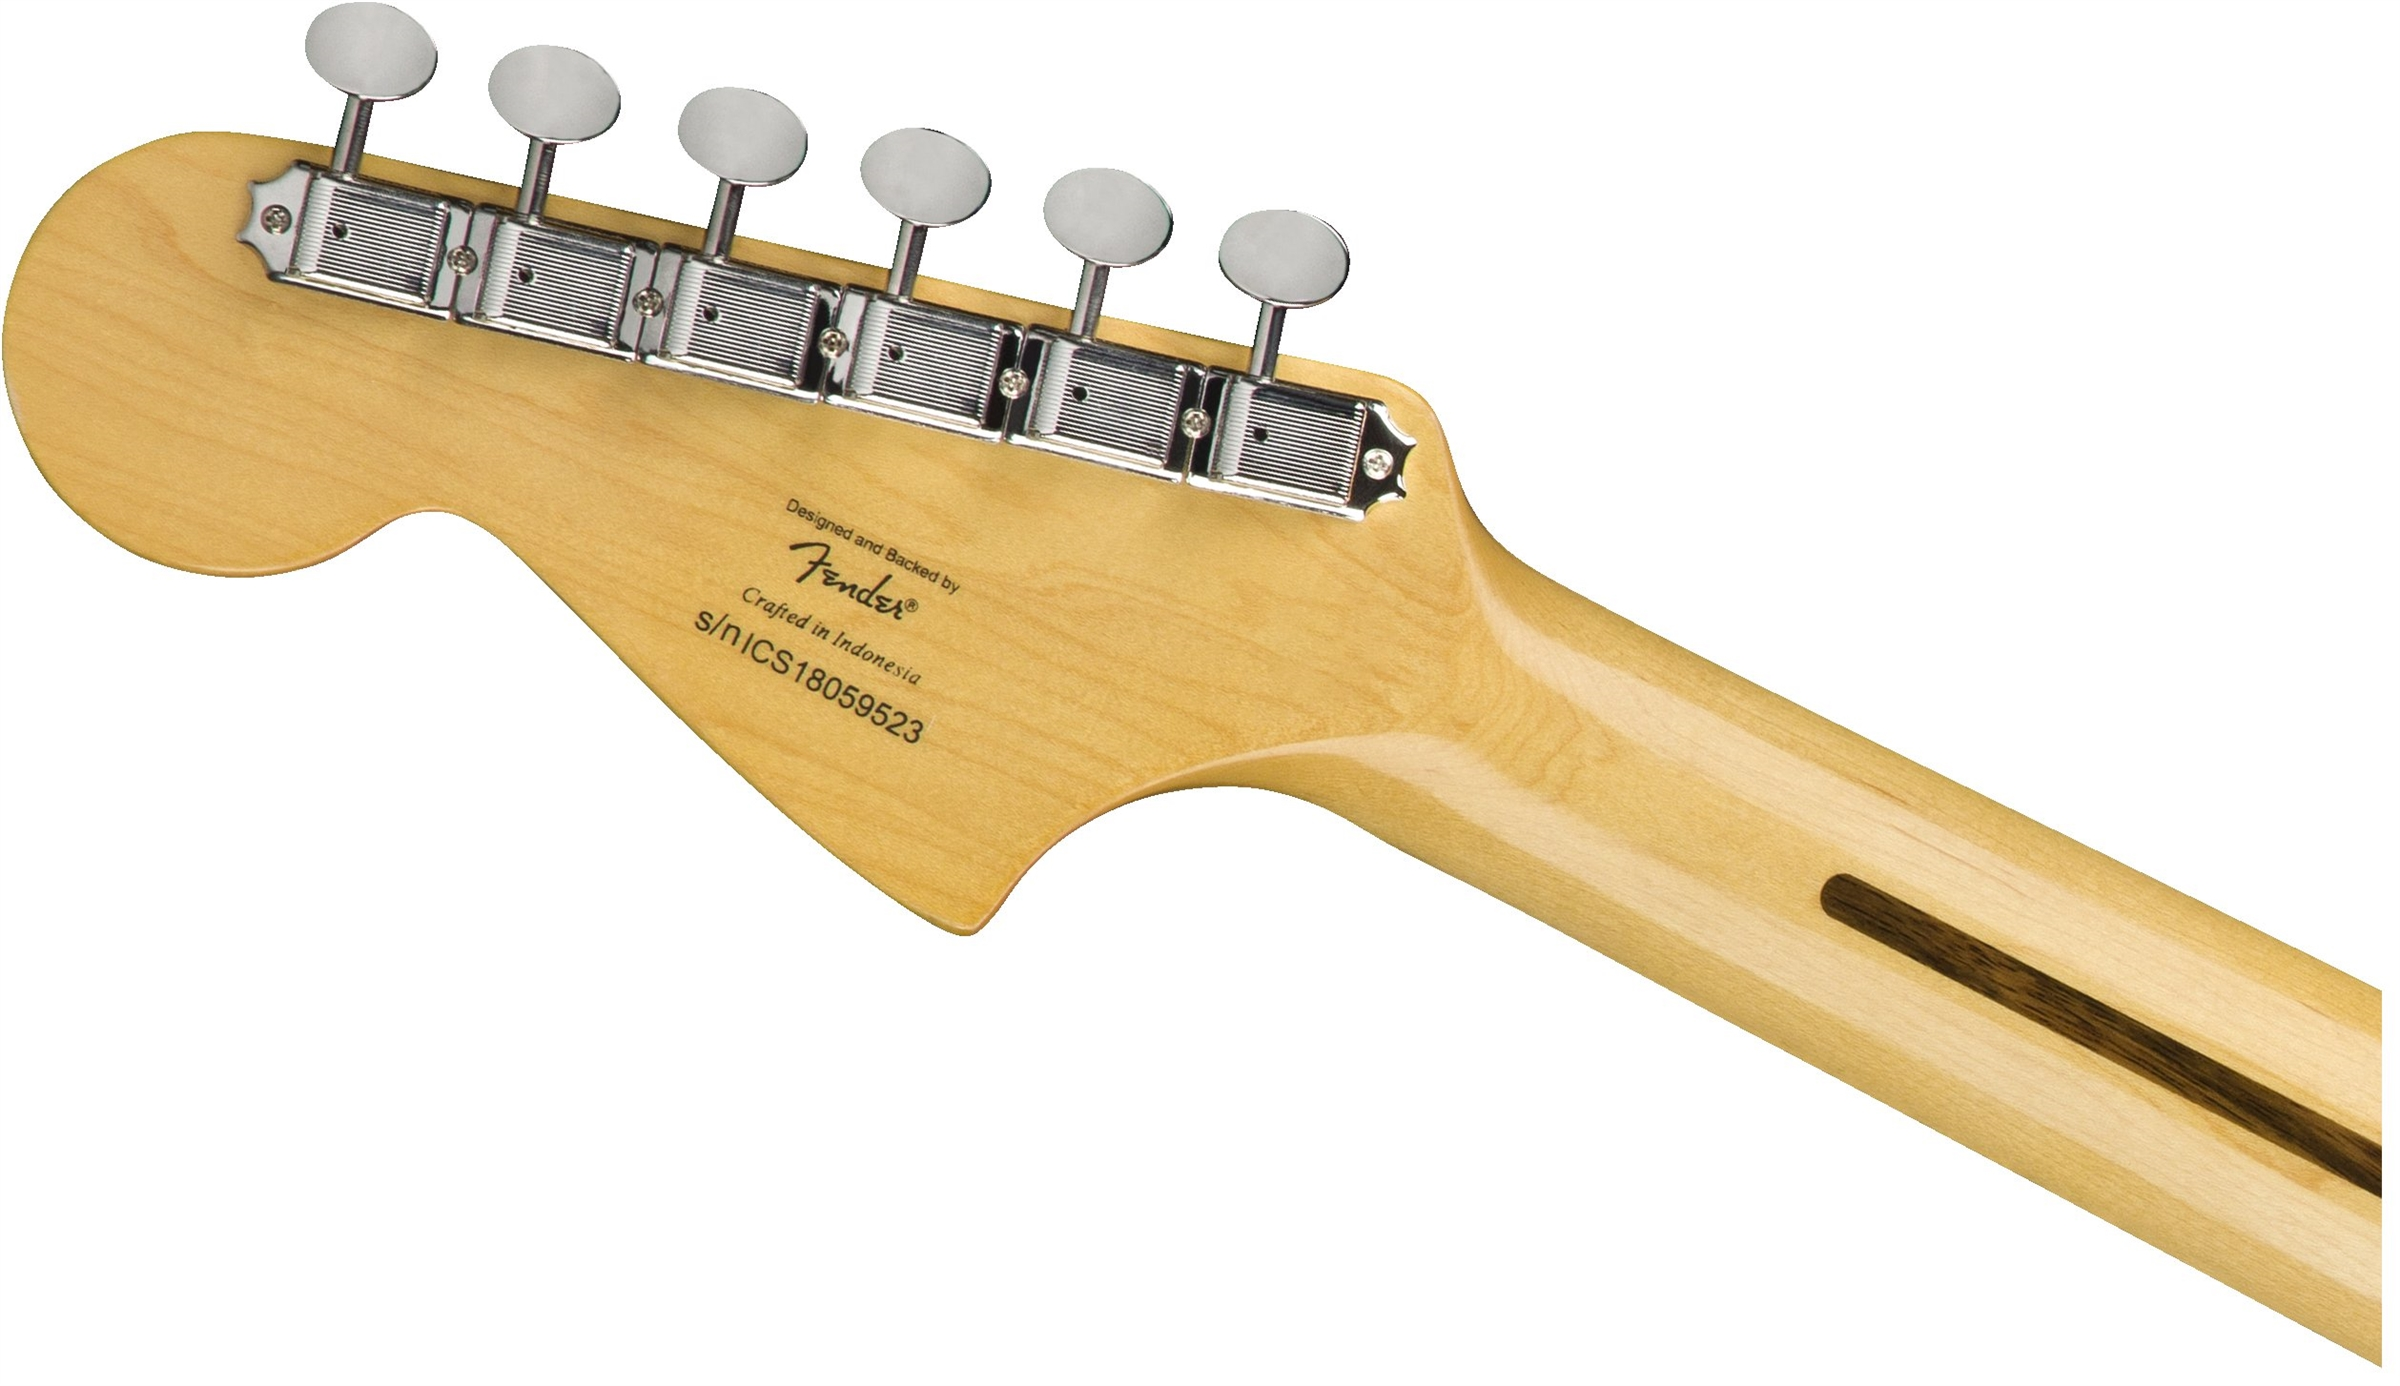 Vintage Modified Jaguar Squier Electric Guitars Acoustasonic Telecaster Wiring Diagram Tap To Expand